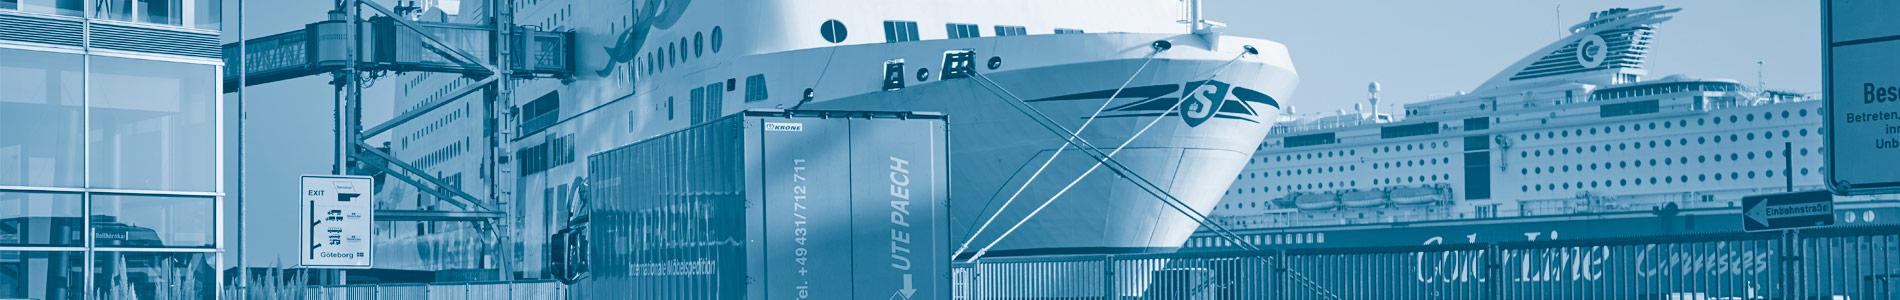 Ute Paech GmbH & Co. KG - Stadtumzug - von Kiel nach Kiel